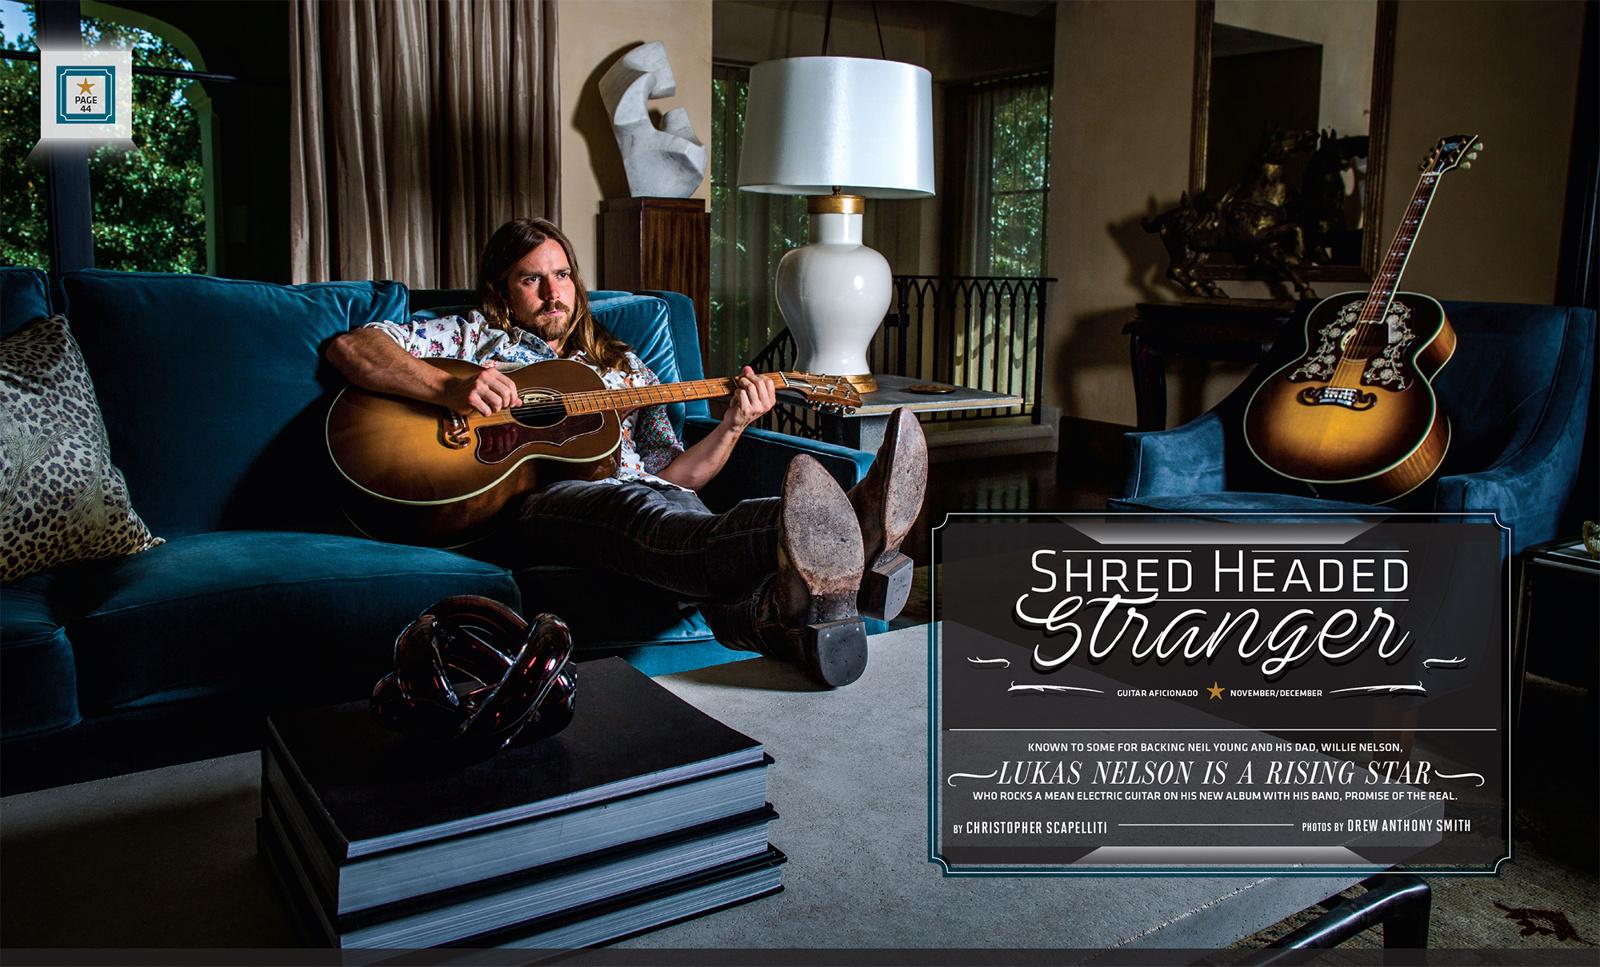 Drew Anthony Smith guitar aficionado lukas nelson